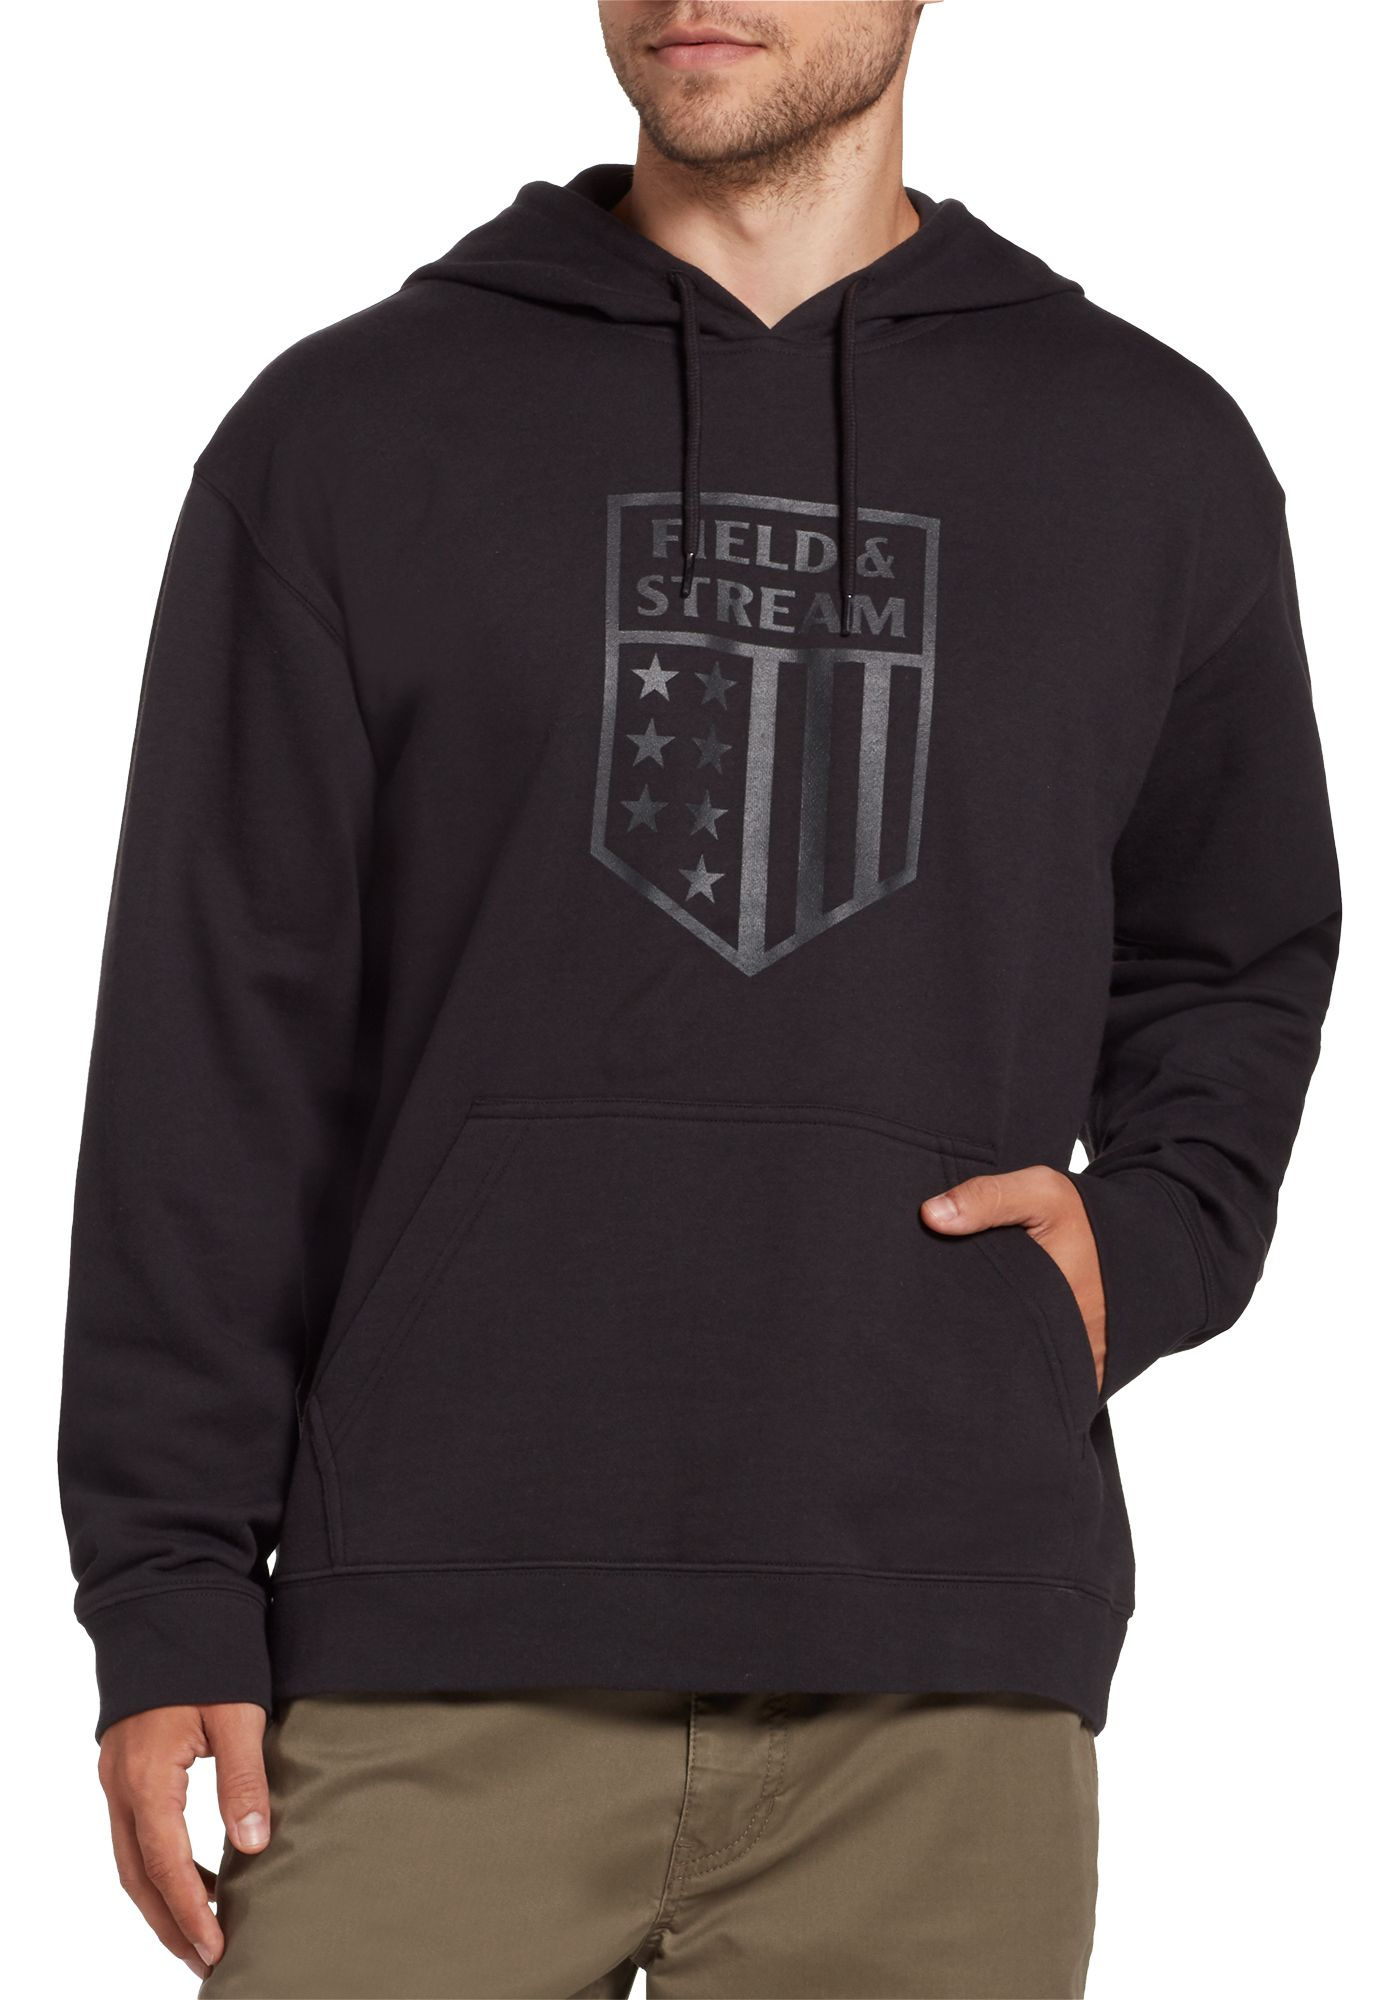 Field & Stream Men's Graphic Hoodie (Regular and Big & Tall)